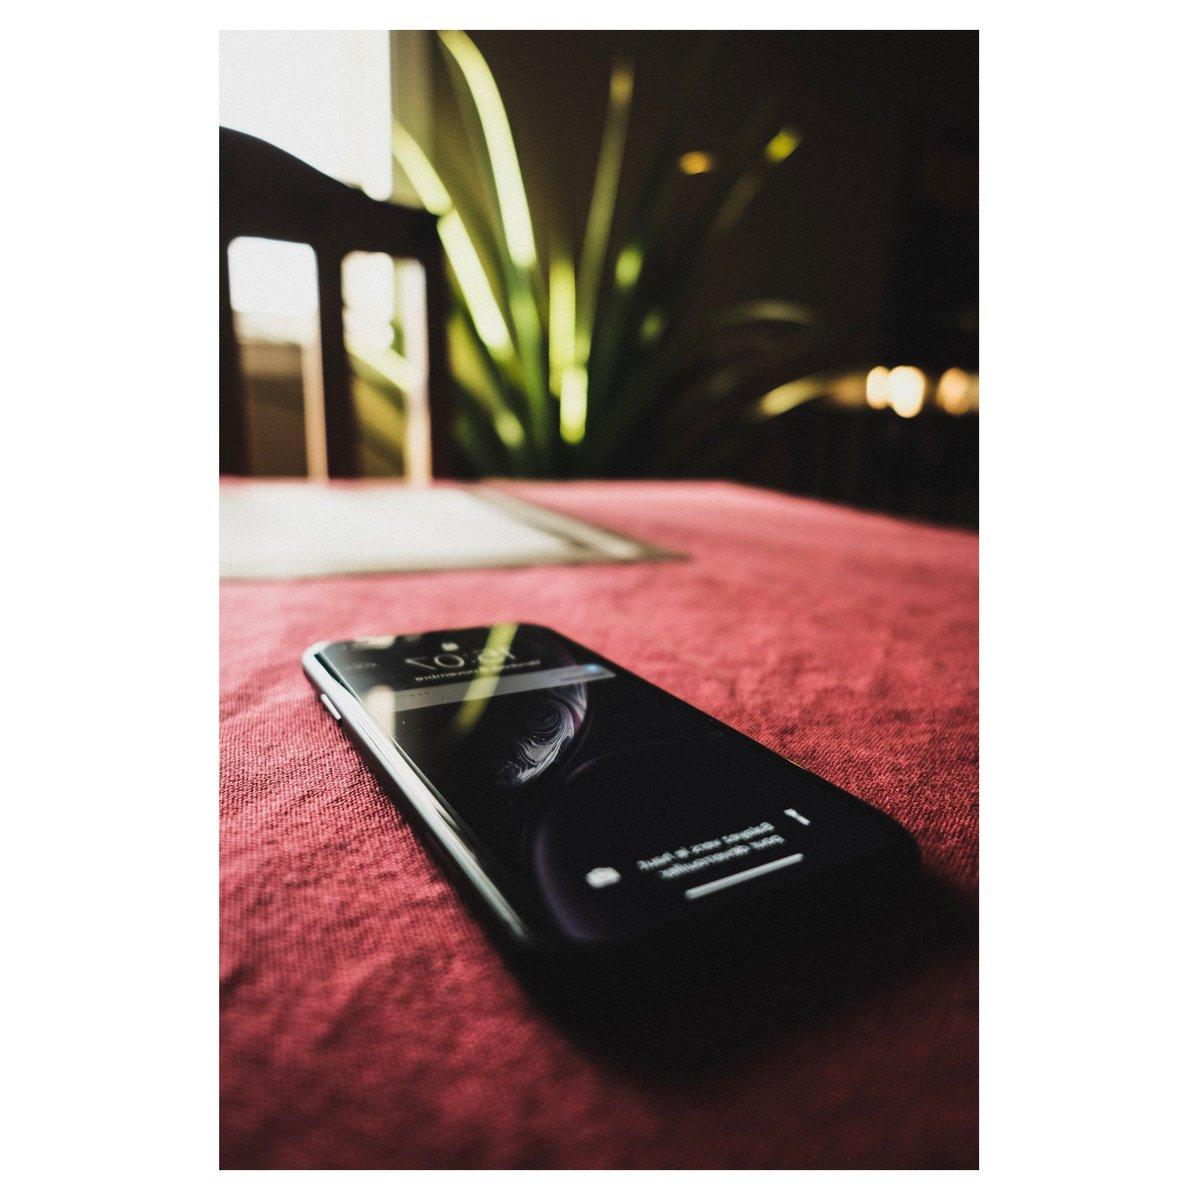 [ Waiting caLL ] . . . . . #rsa #subjectivelyobjective #newtopography #fujifilm #cinematicphotography #myFujifilm #lekkerzine #fujiframez #ifyouleave #phroom #broadmag #ourmomentum #fisheyelemag #photocinematica #somewheremagazine #lensculture #fujifeed #yetmagazine #verybusymag